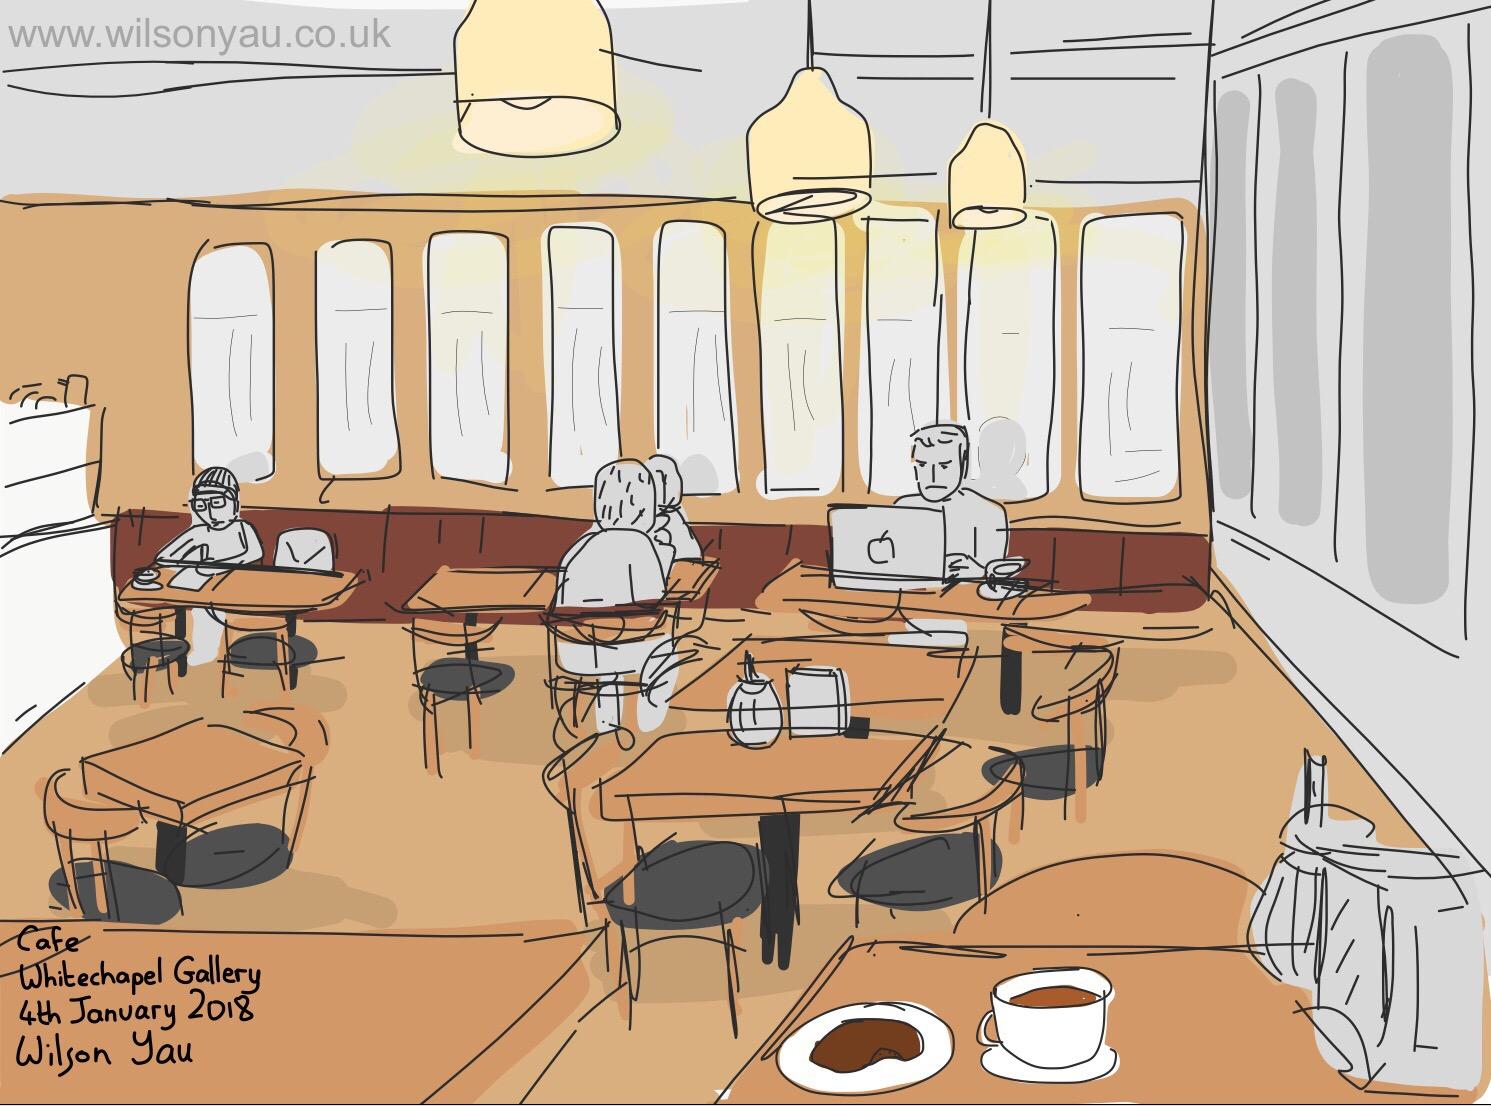 Cafe, Whitechapel Gallery, 4th January 2018